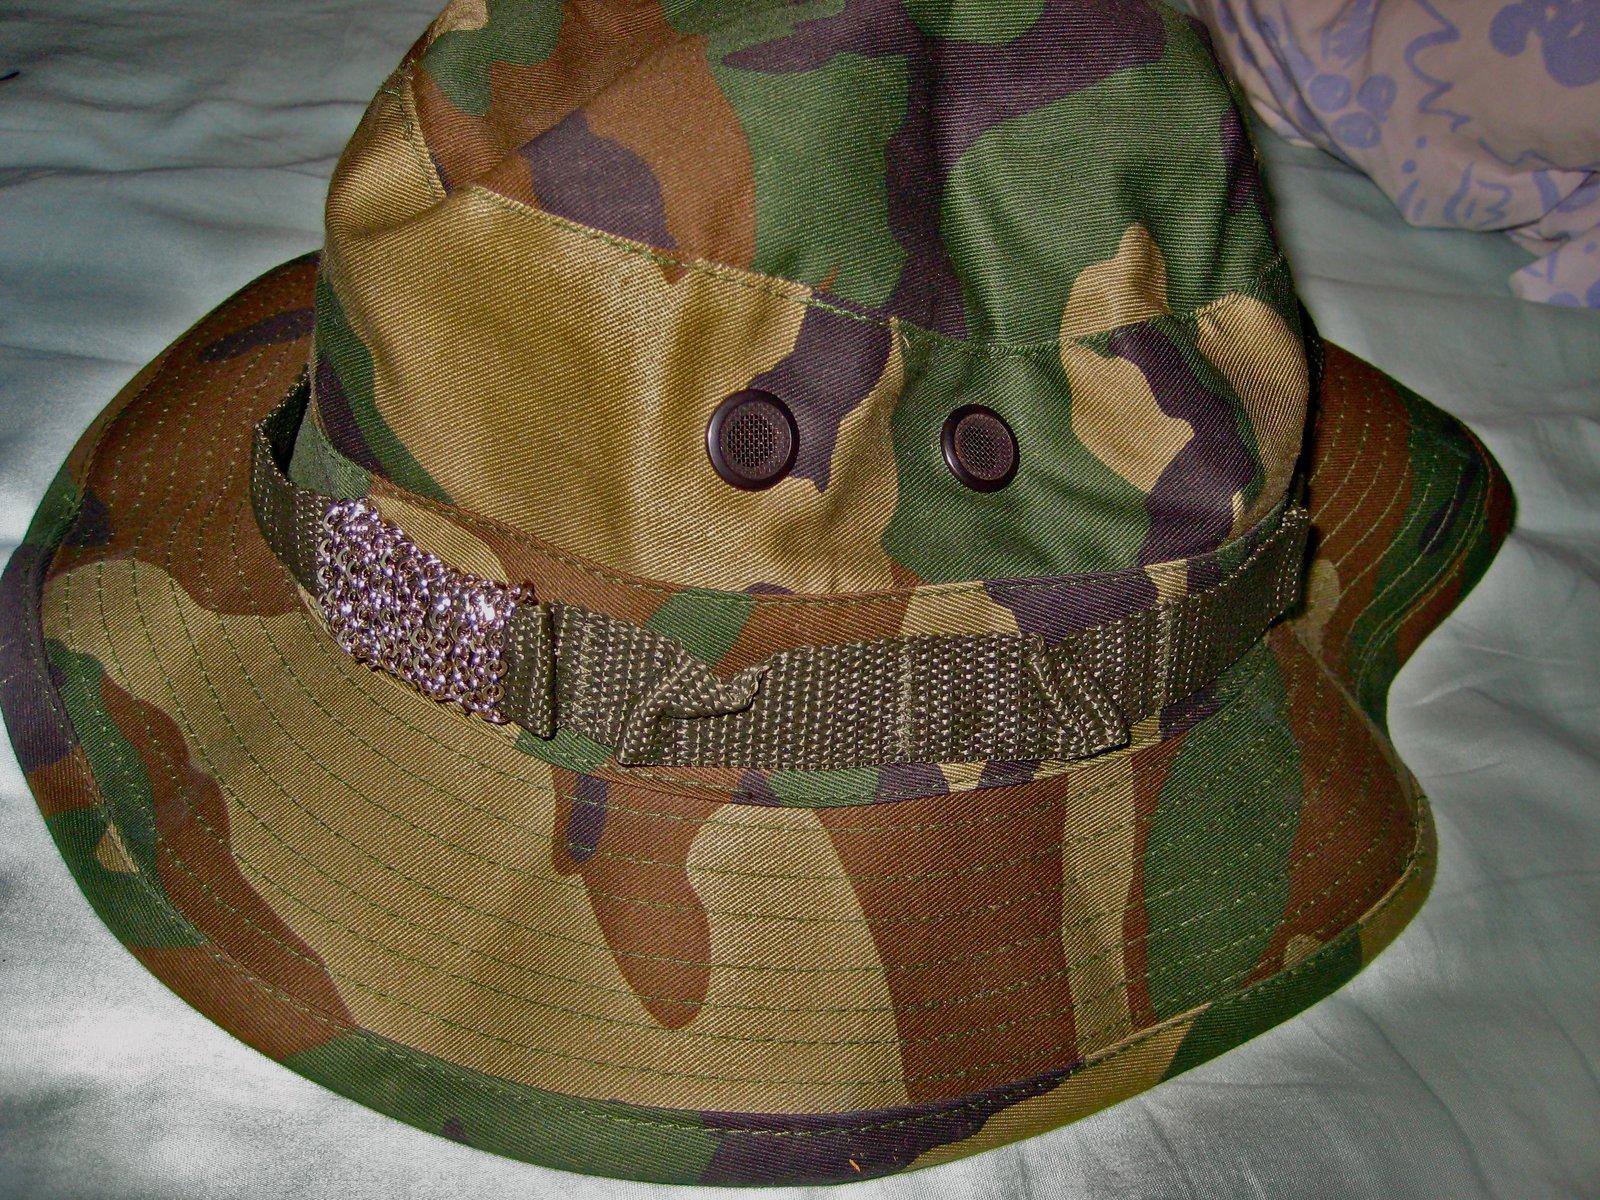 Icy bucket hat.